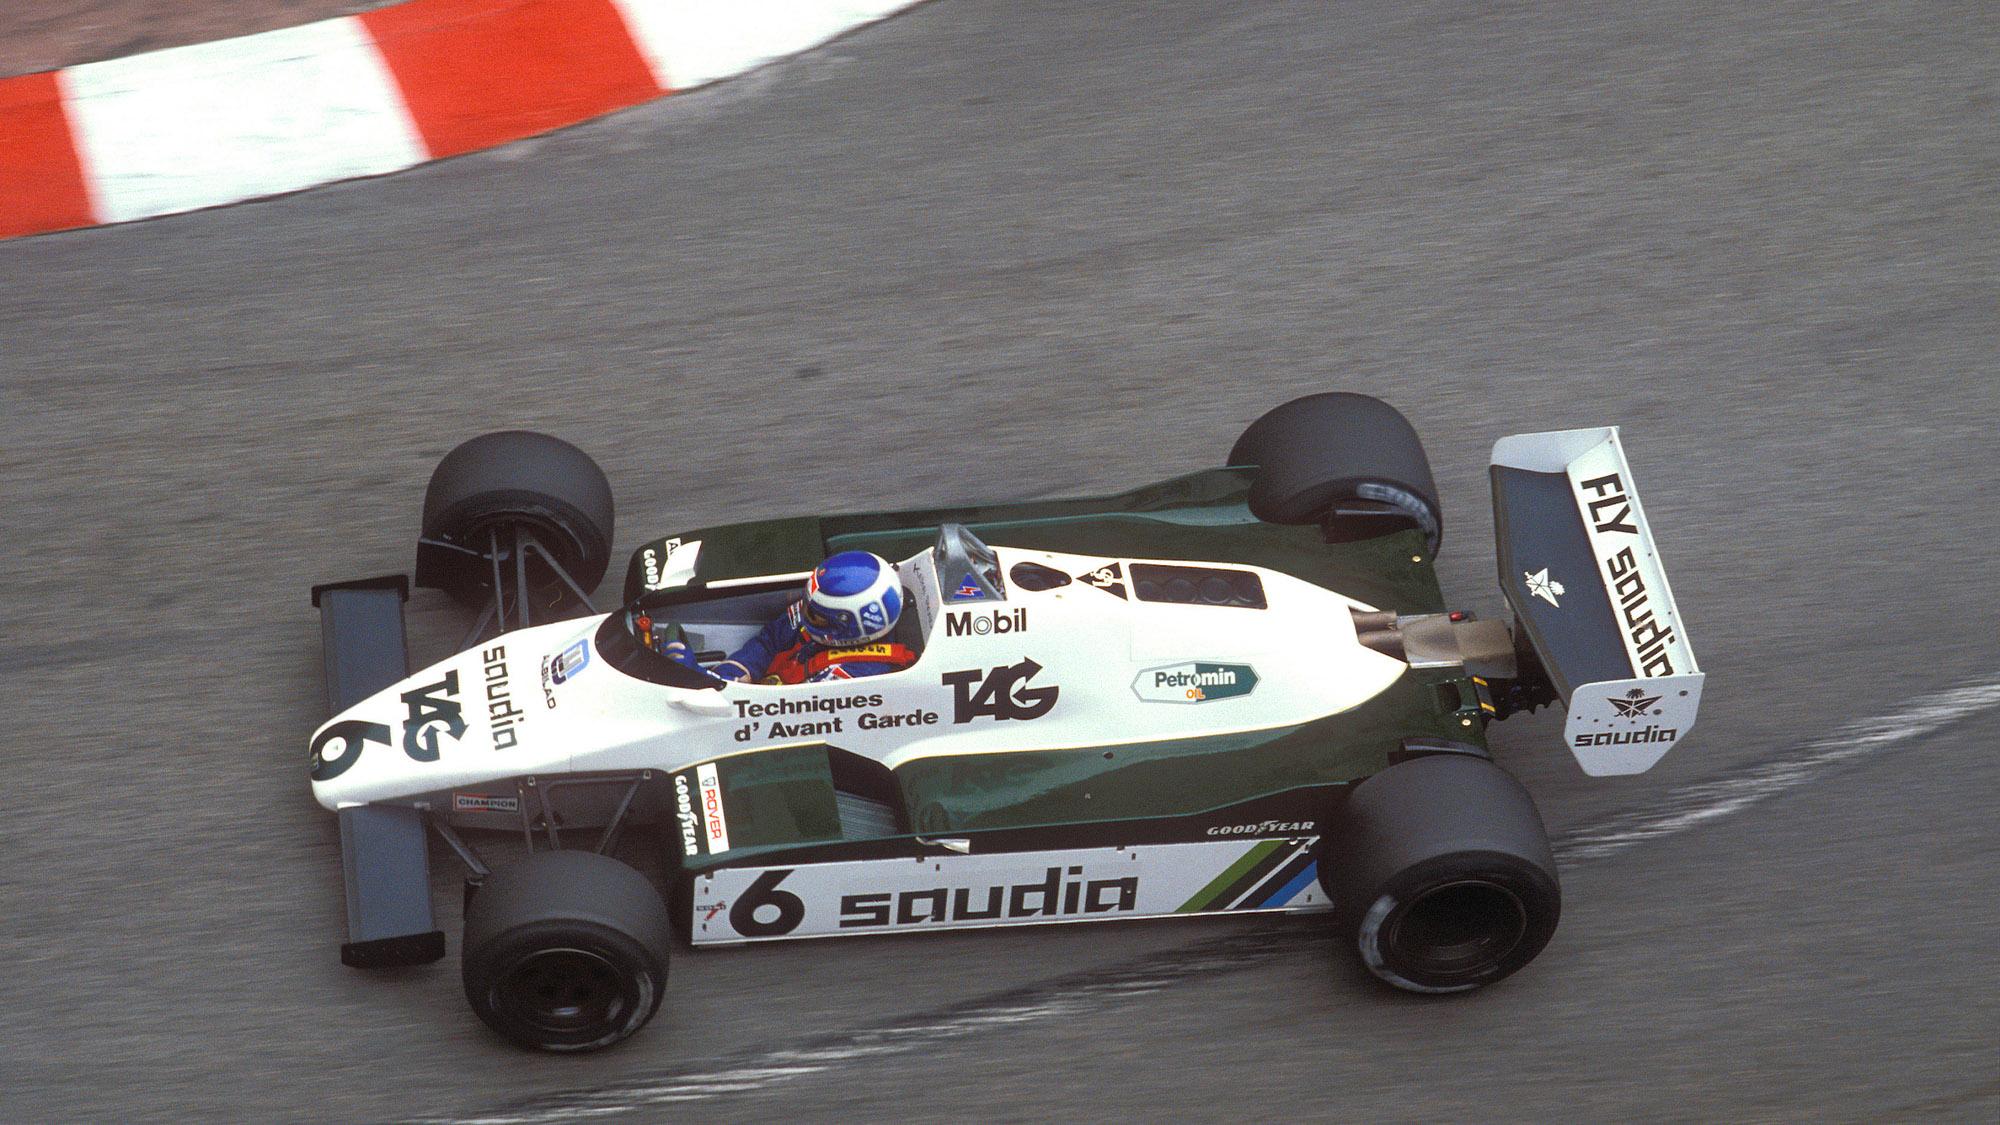 Keke Rosberg in the Williams at the 1982 Monaco Grand Prix